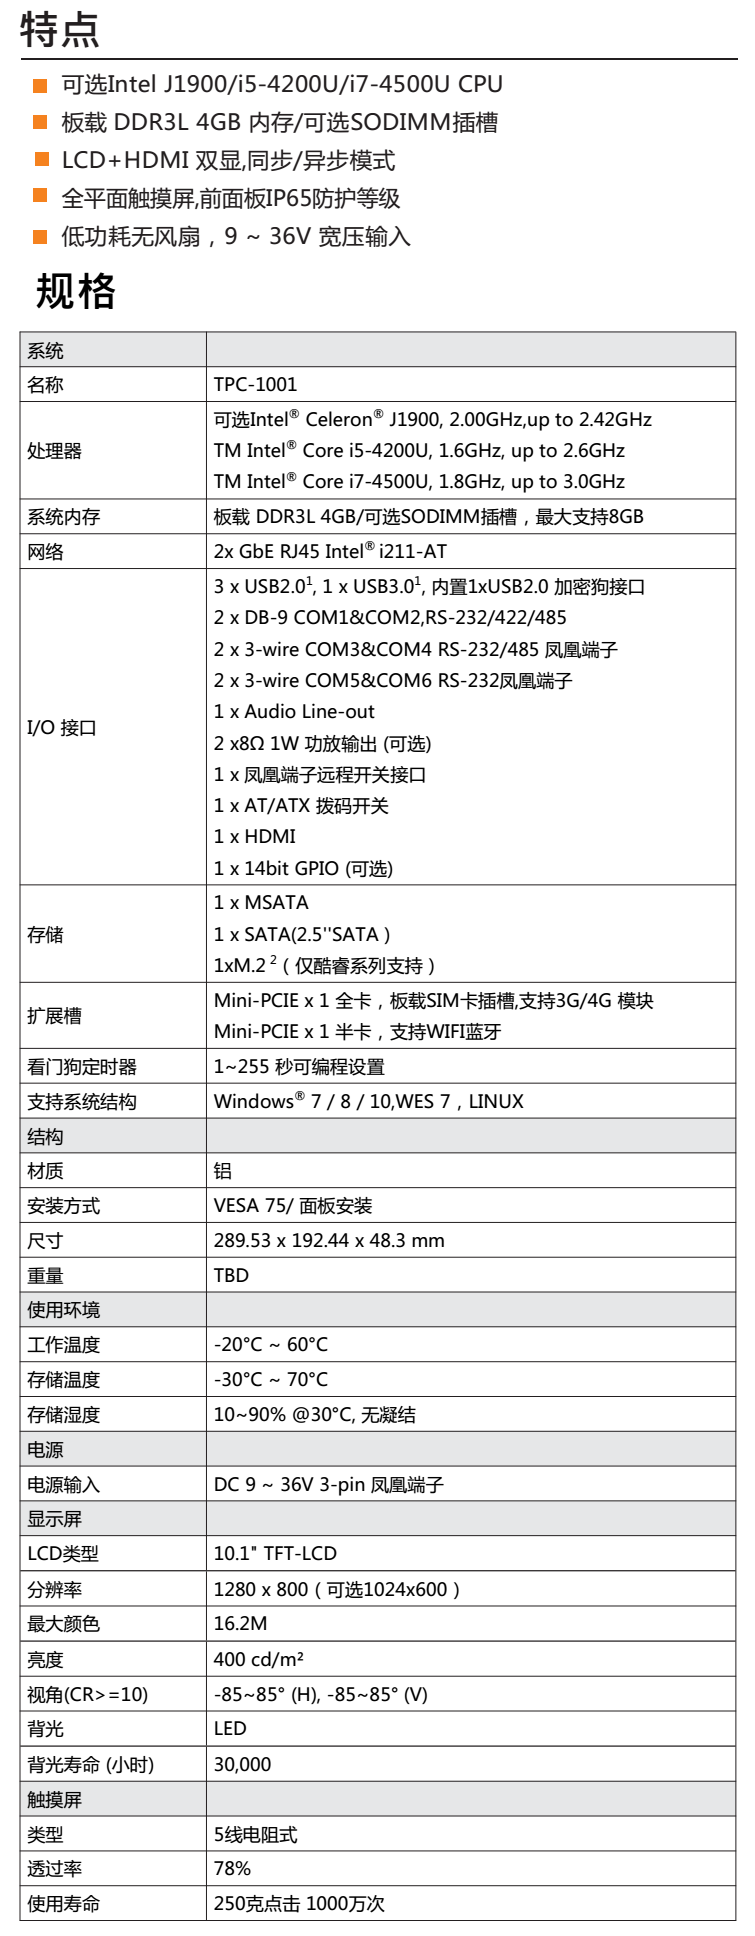 QQ图片20200418140950.png